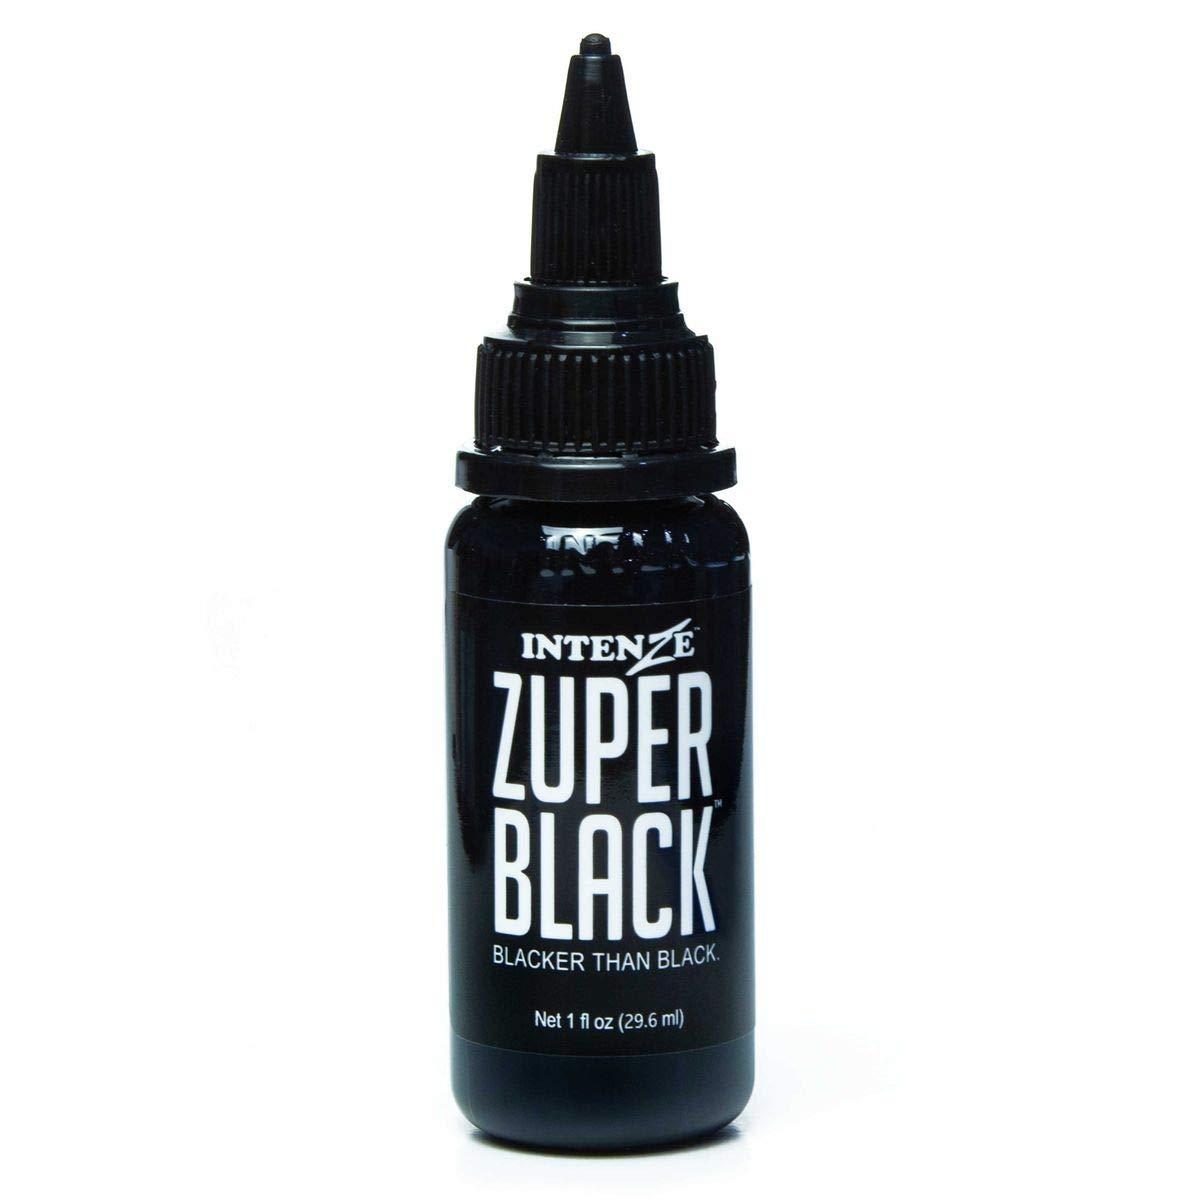 INTENZE Products Zuper Black - 1 oz.